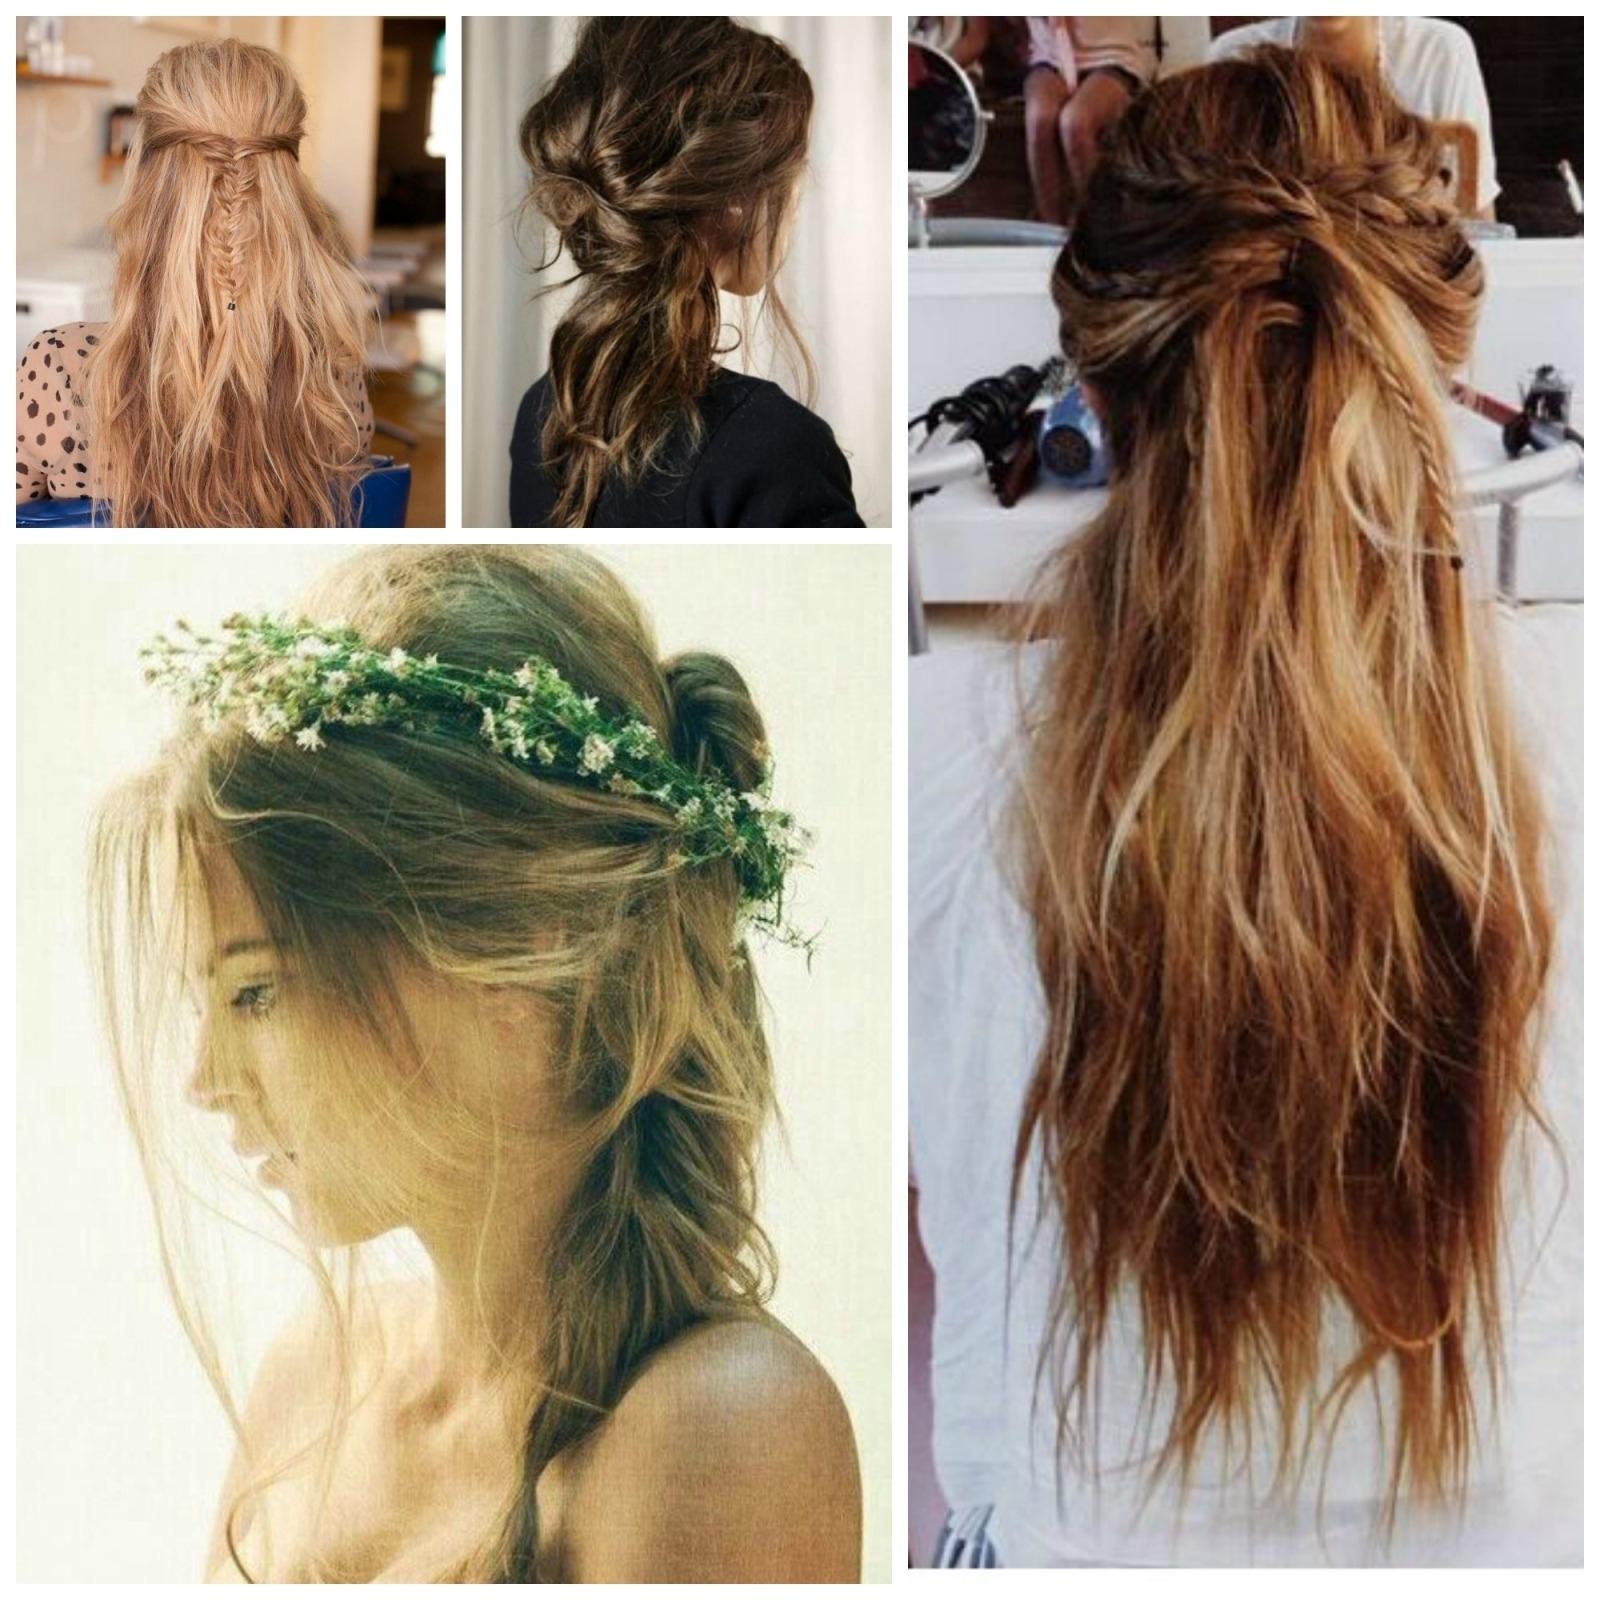 Diy Perfect Summer Boho Hairstyles – High Style Life Regarding Boho Updos For Long Hair (Gallery 11 of 15)